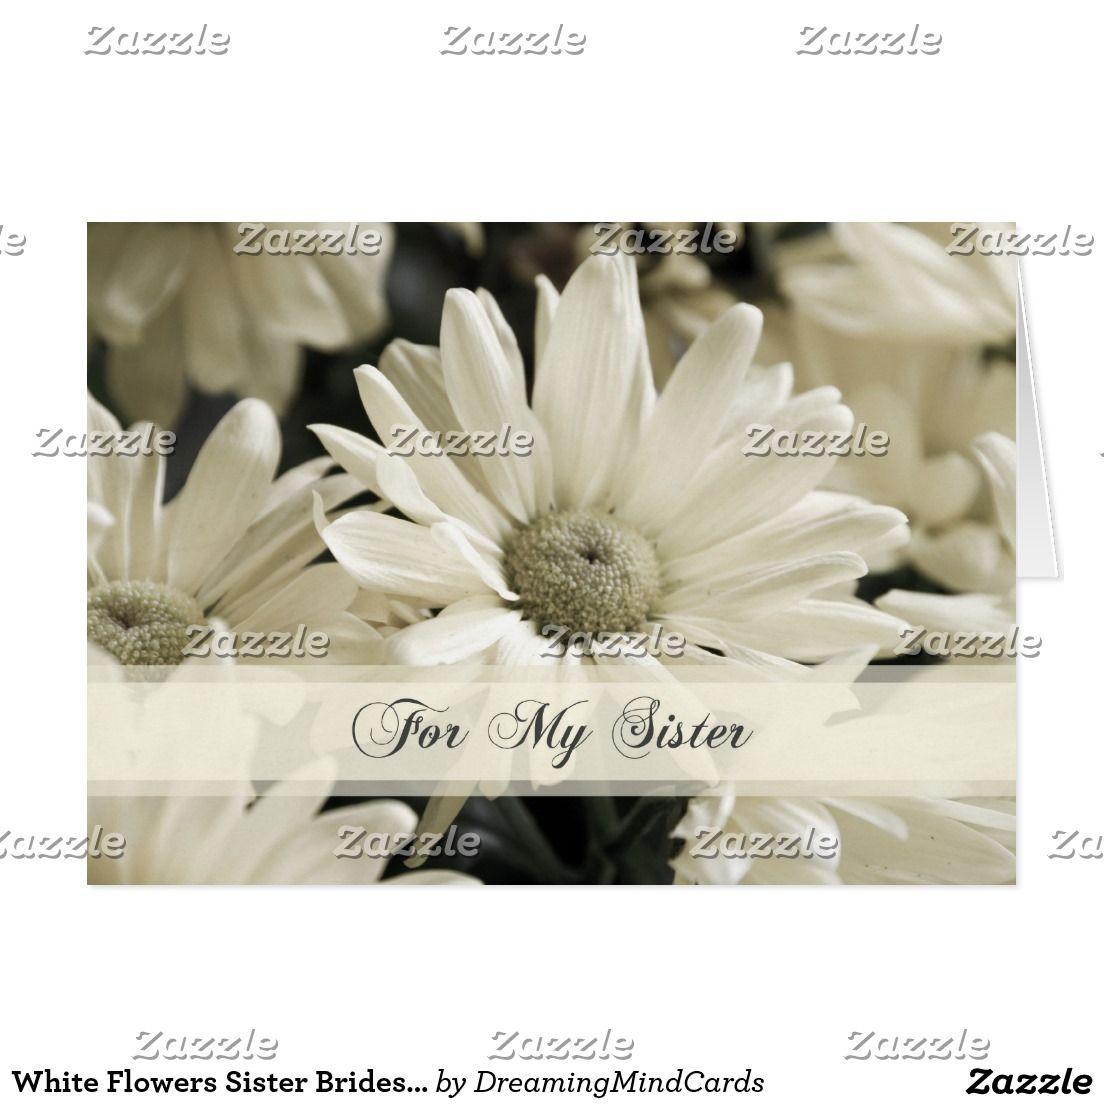 White flowers sister bridesmaid invitation card zazzle